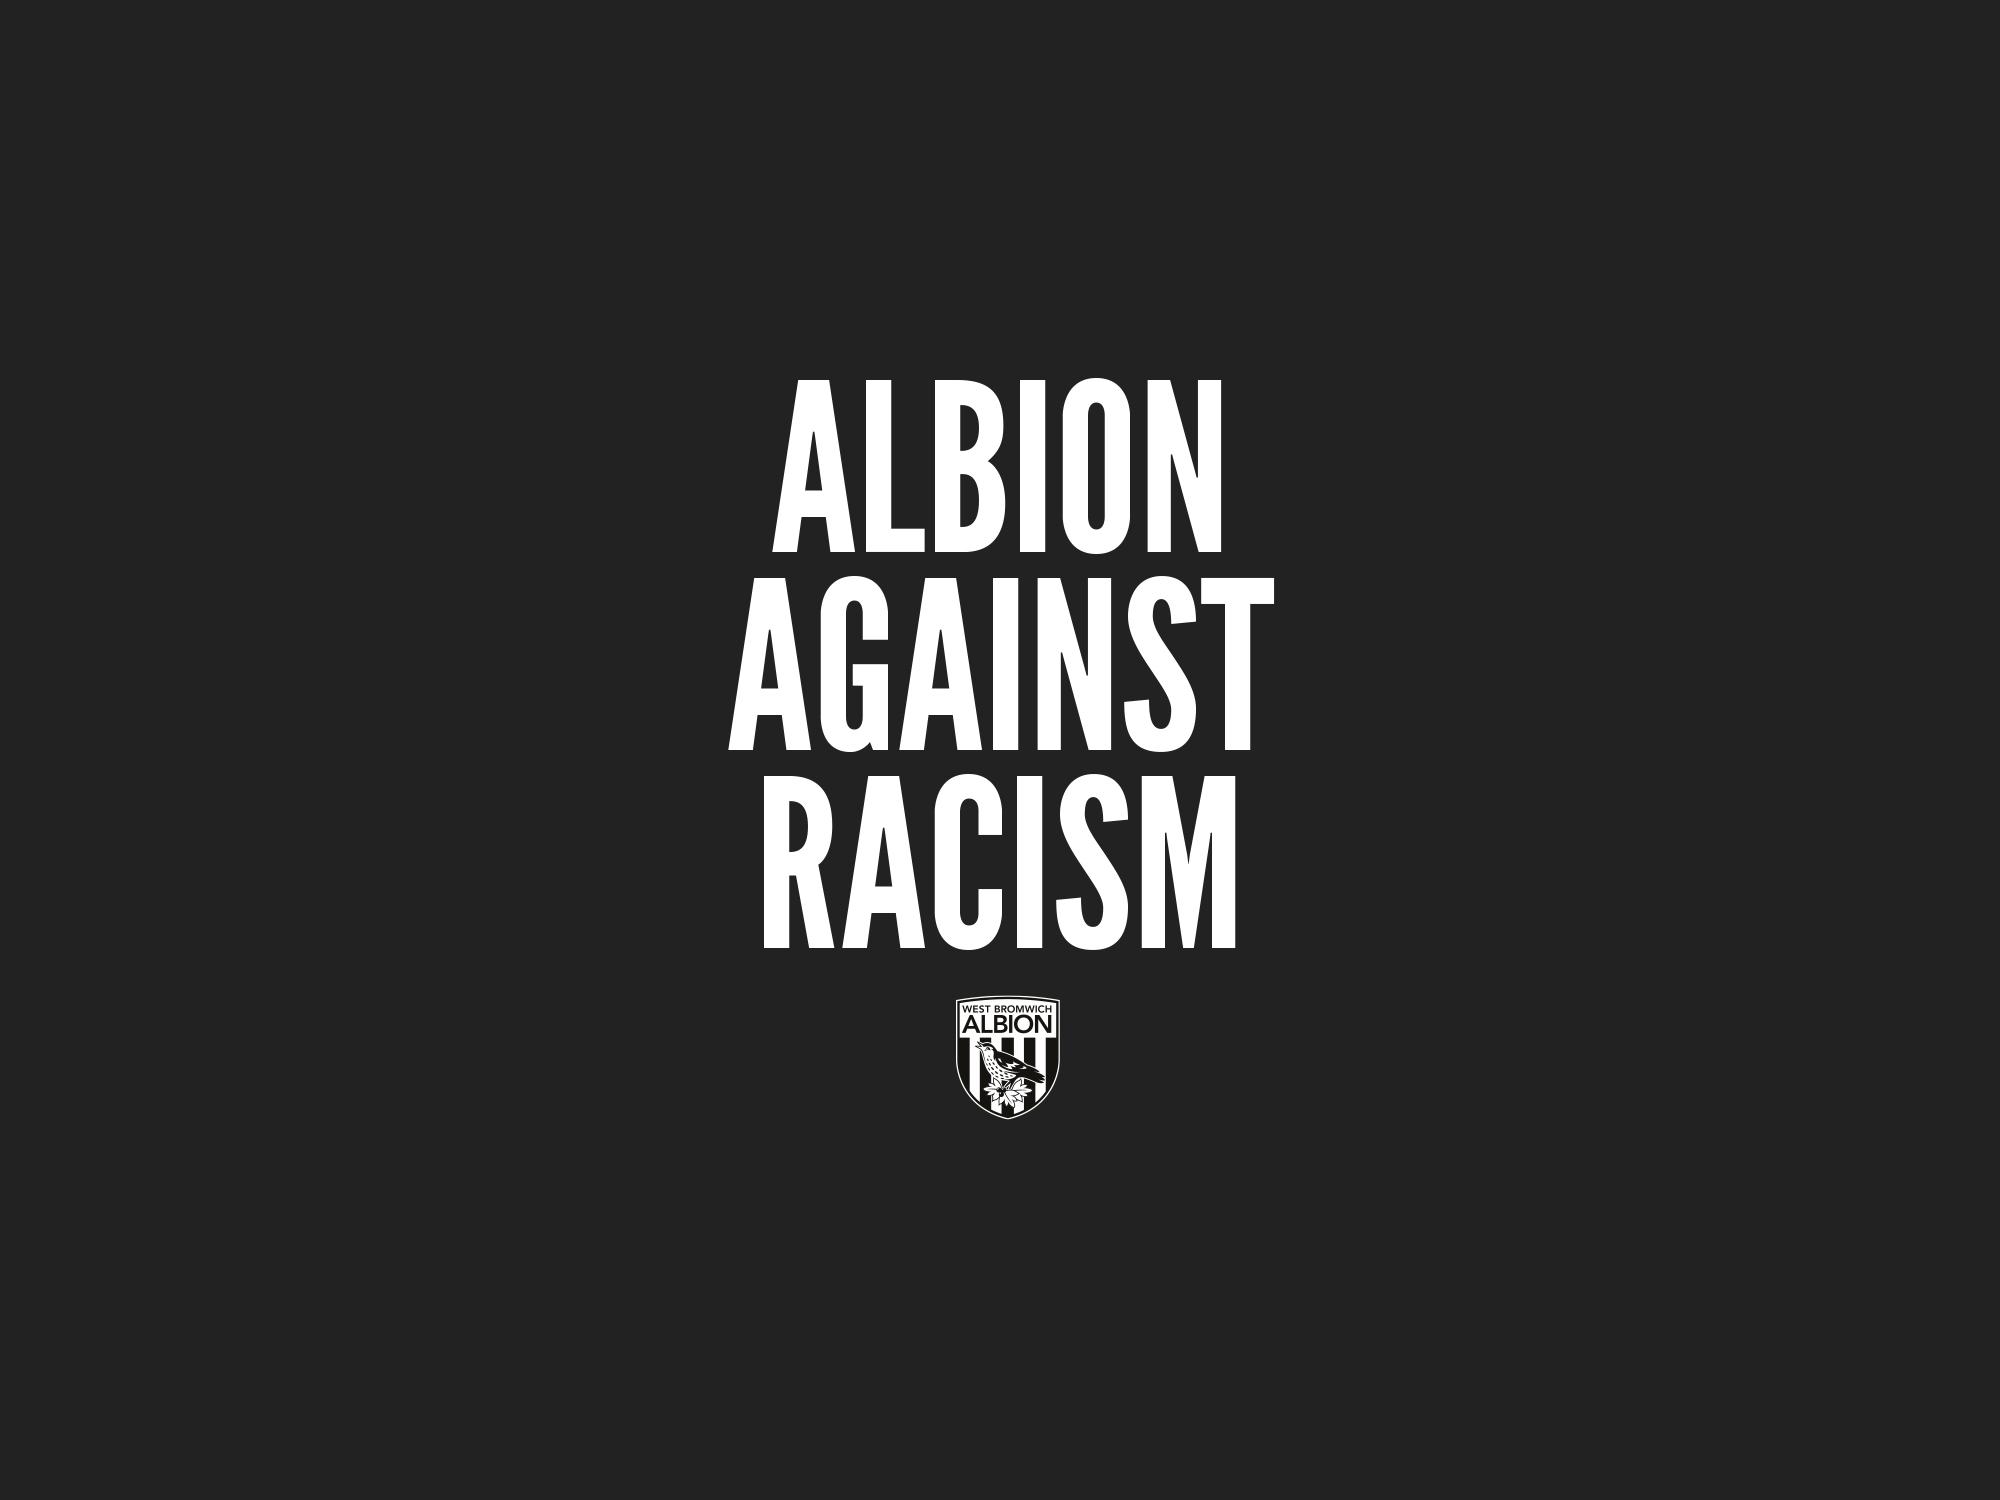 Albion against racism